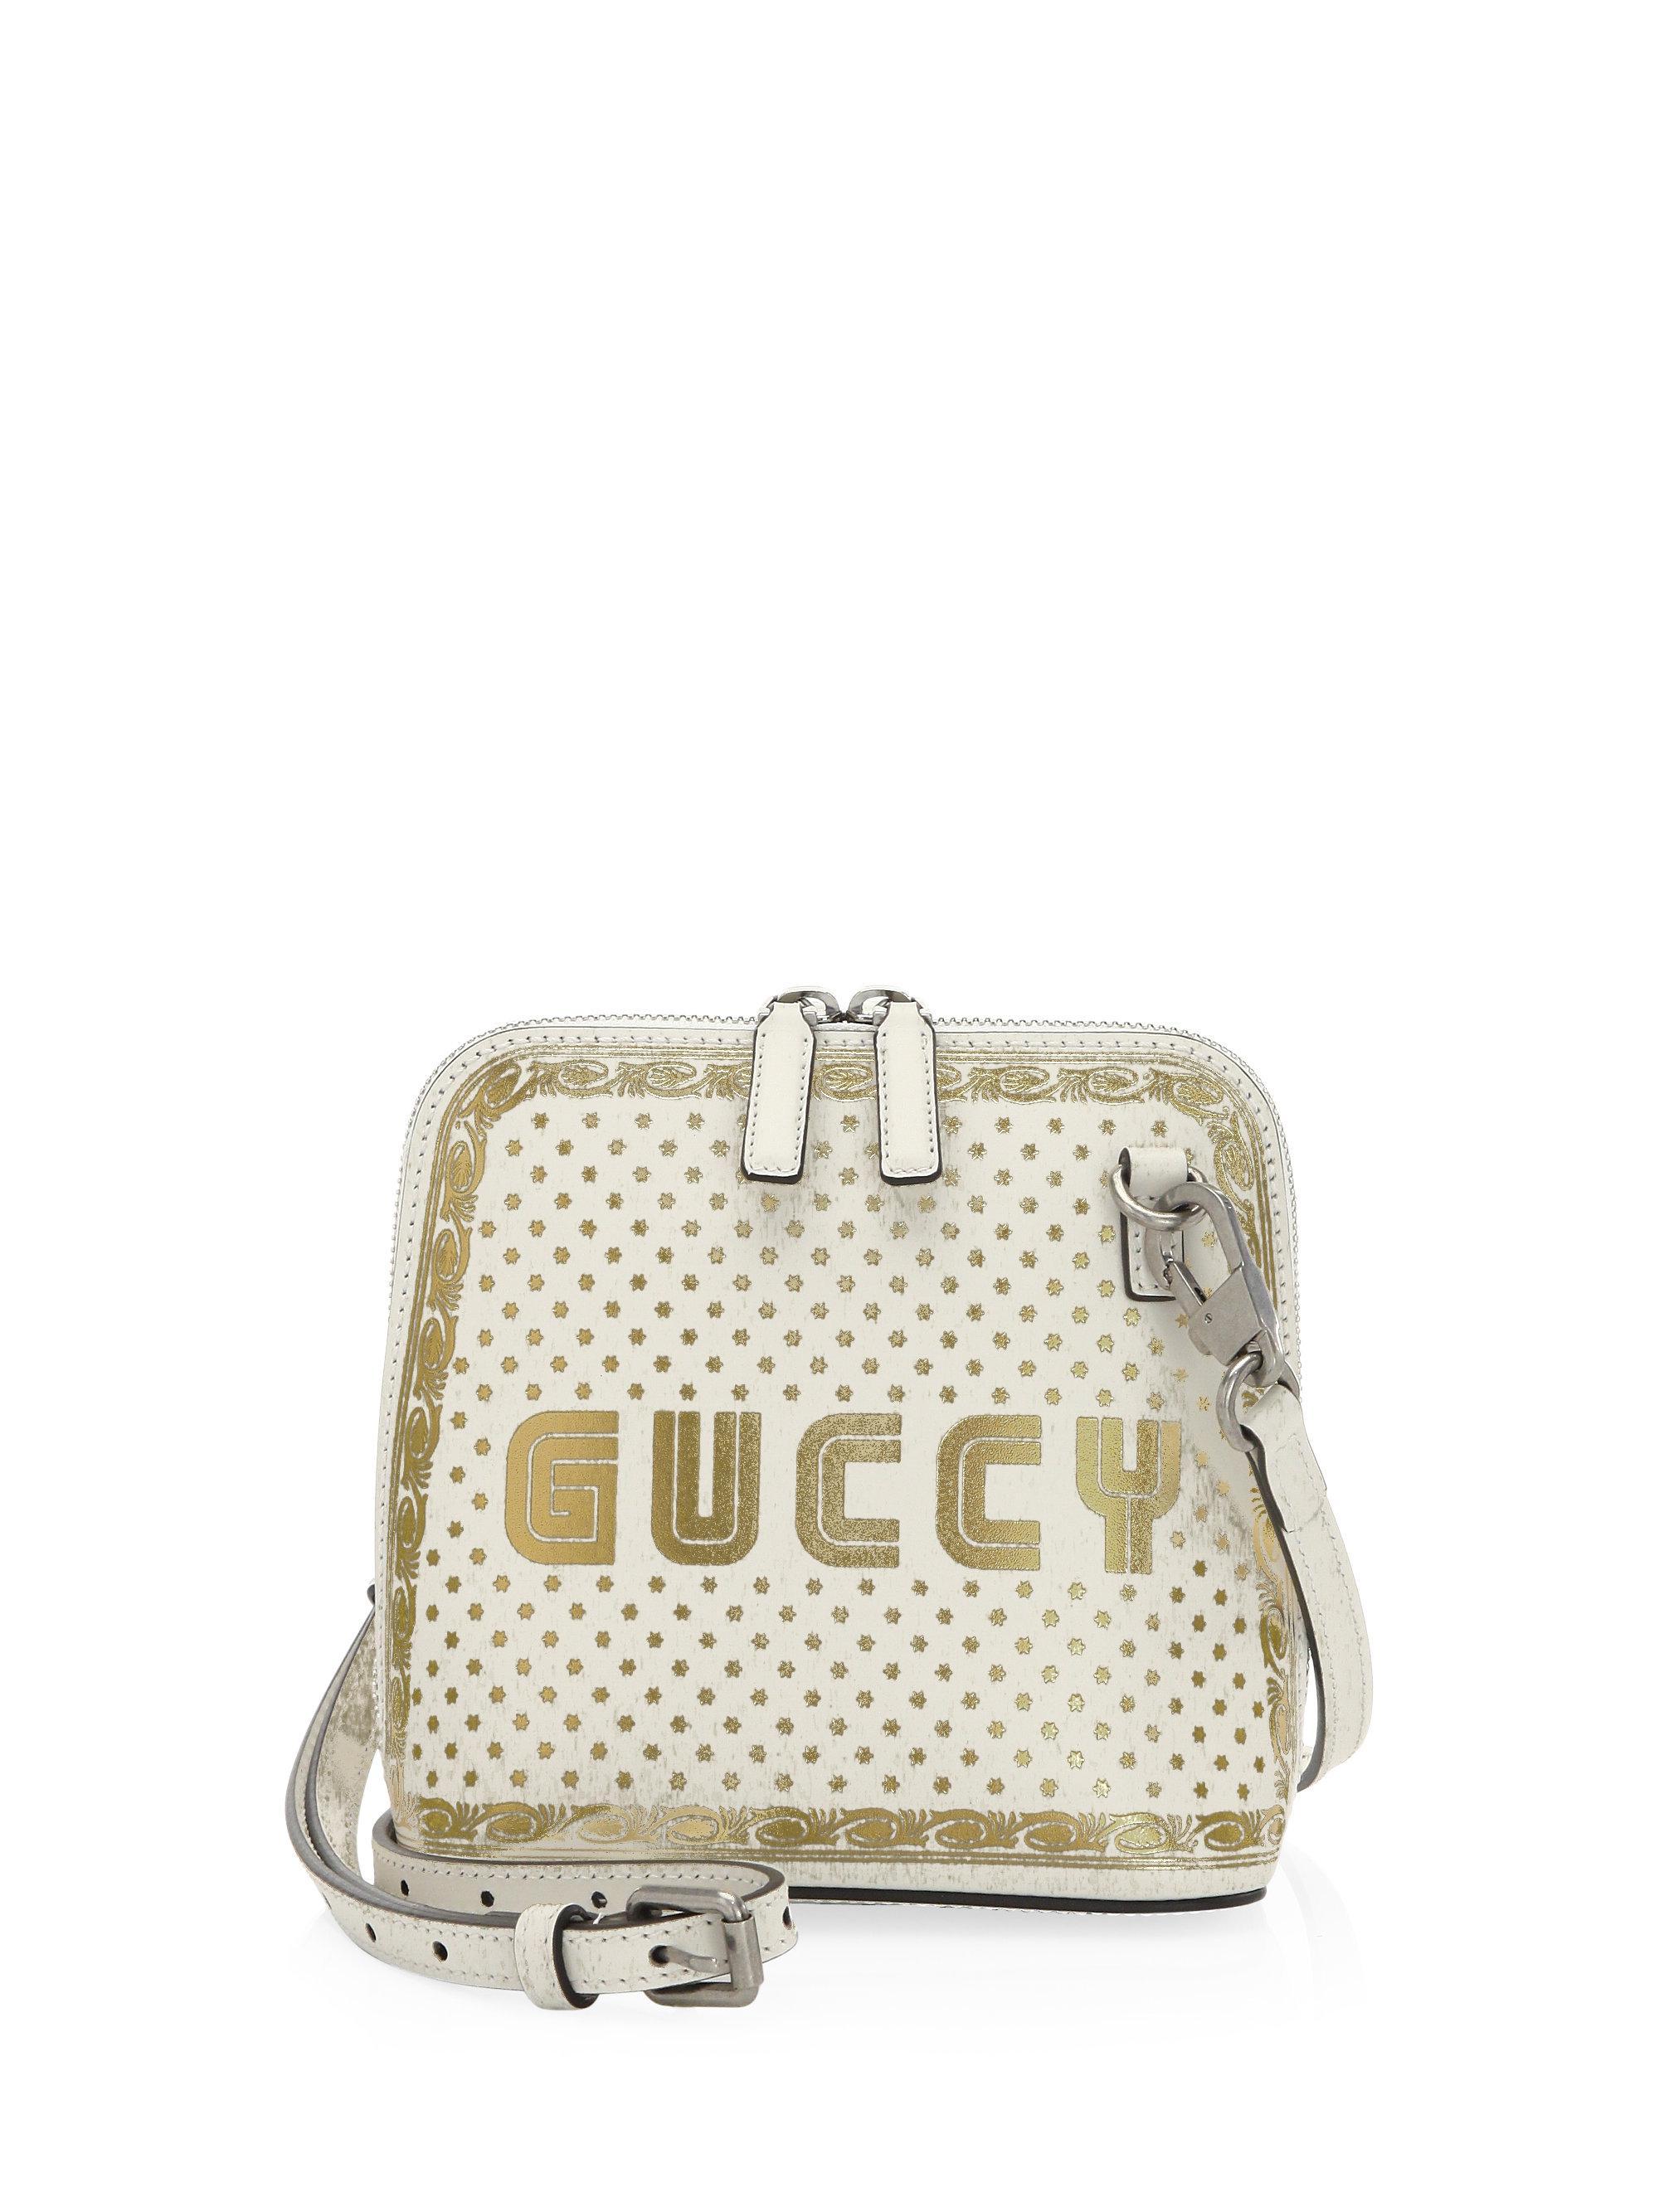 Gucci Leather Mini Guccy Sega® Print